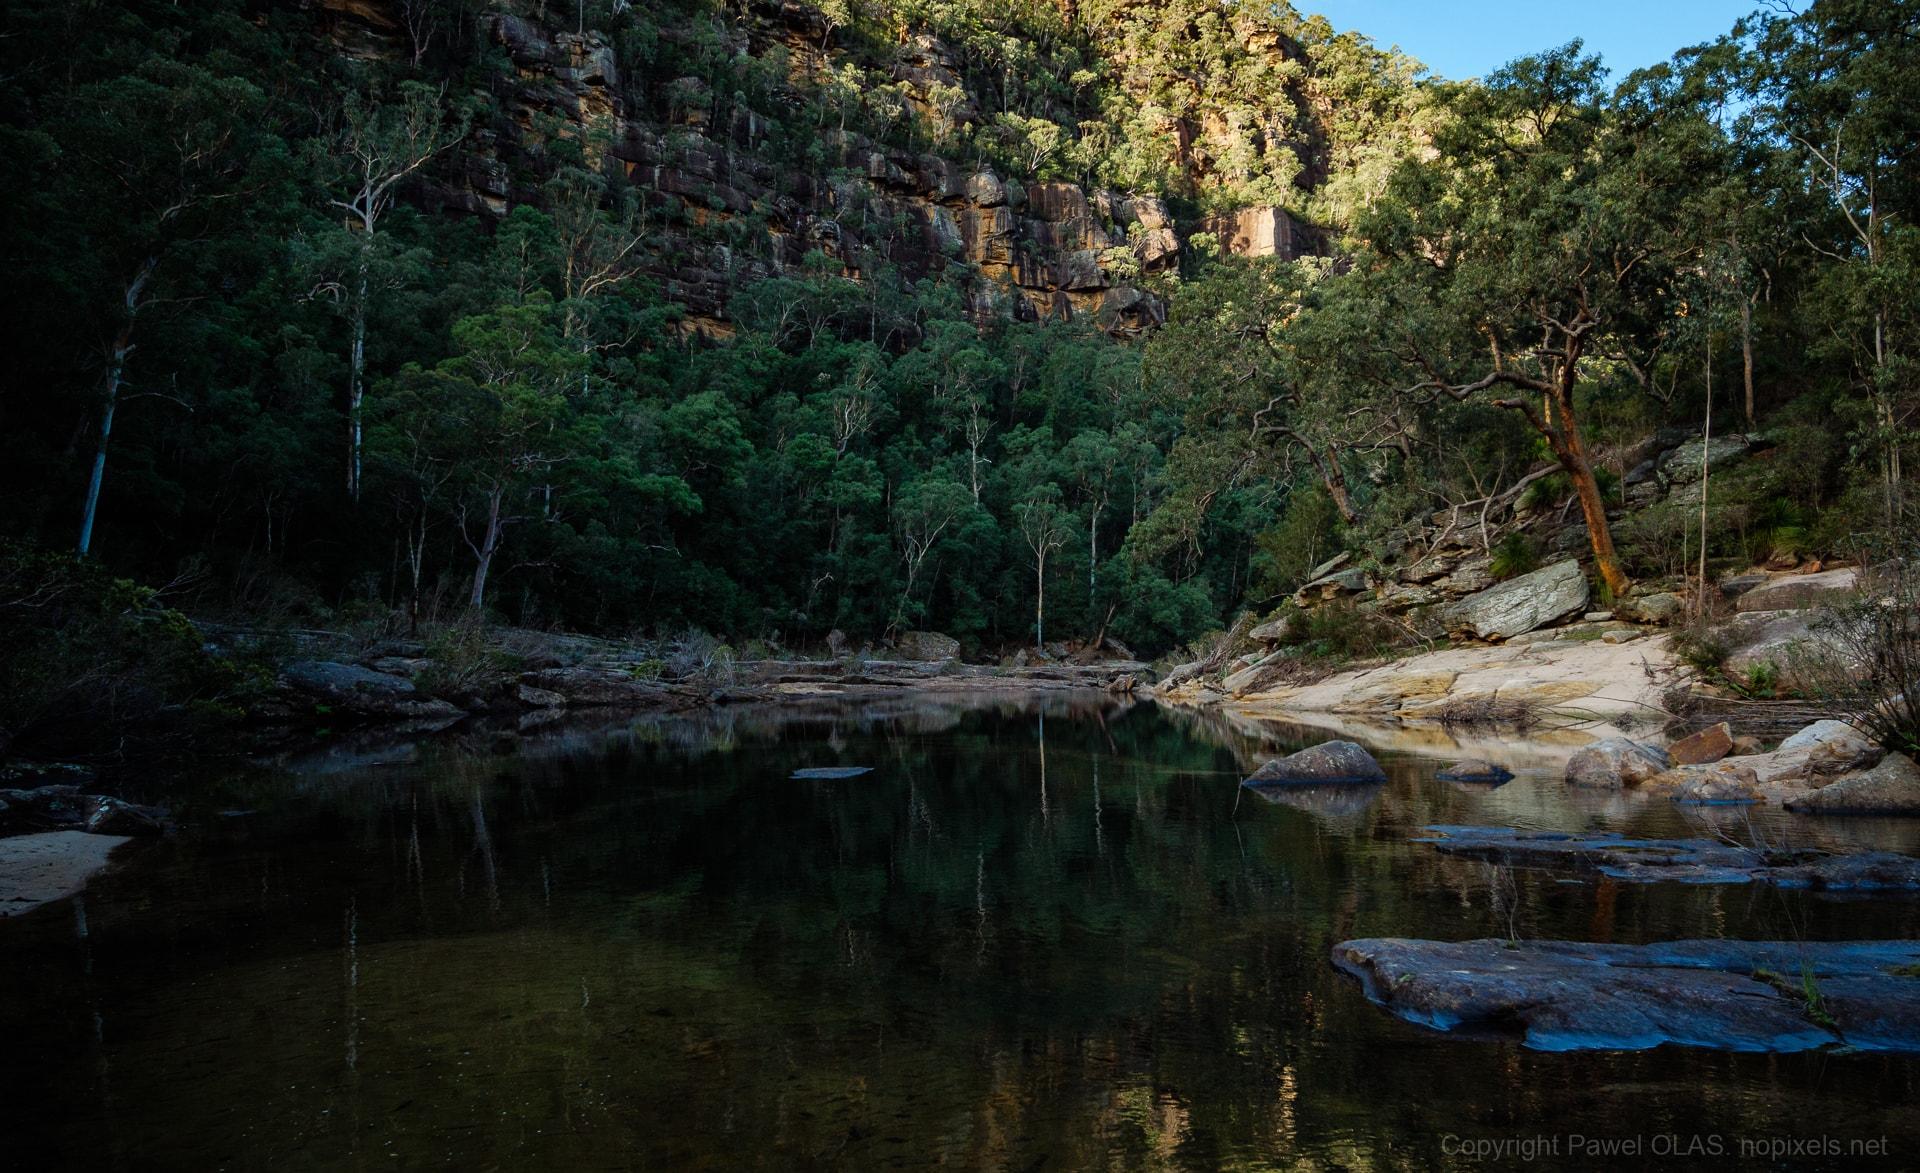 Erskine Creek from Pisgah Rock.